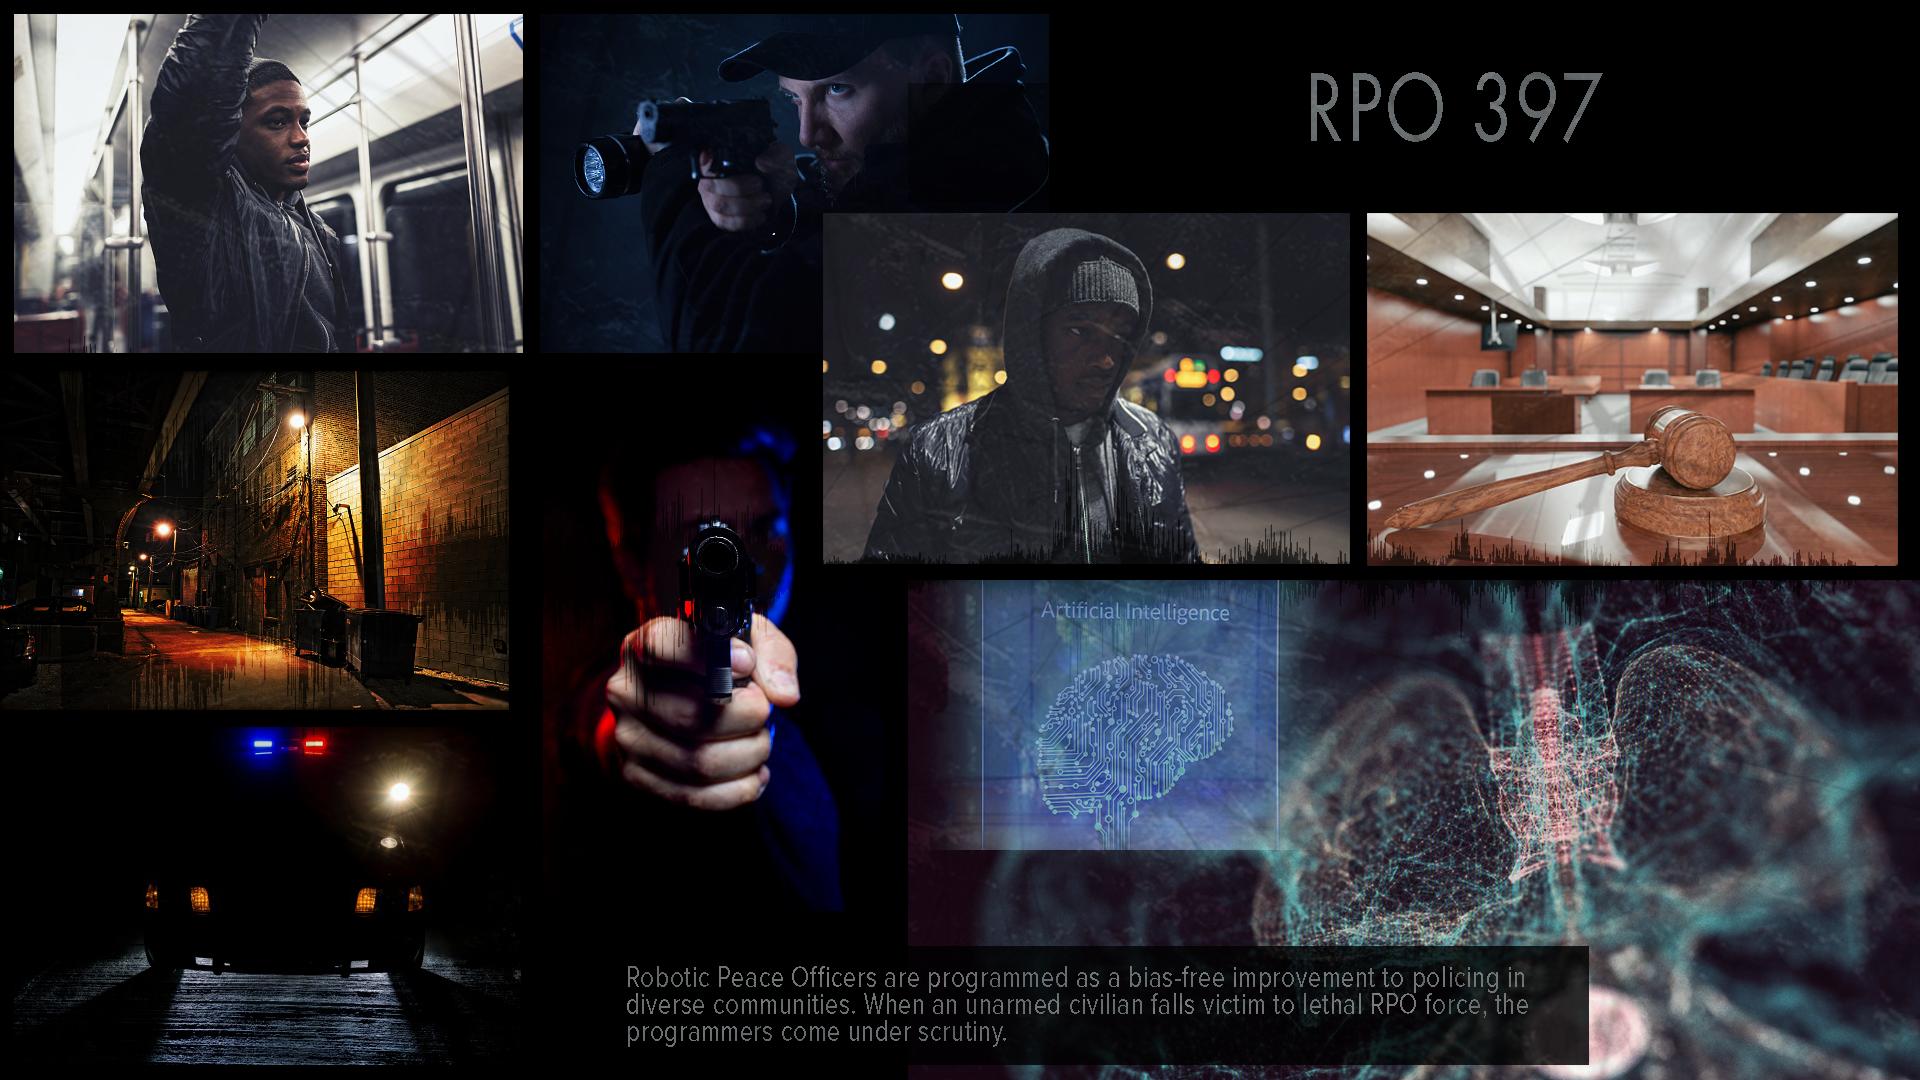 RPO397.png